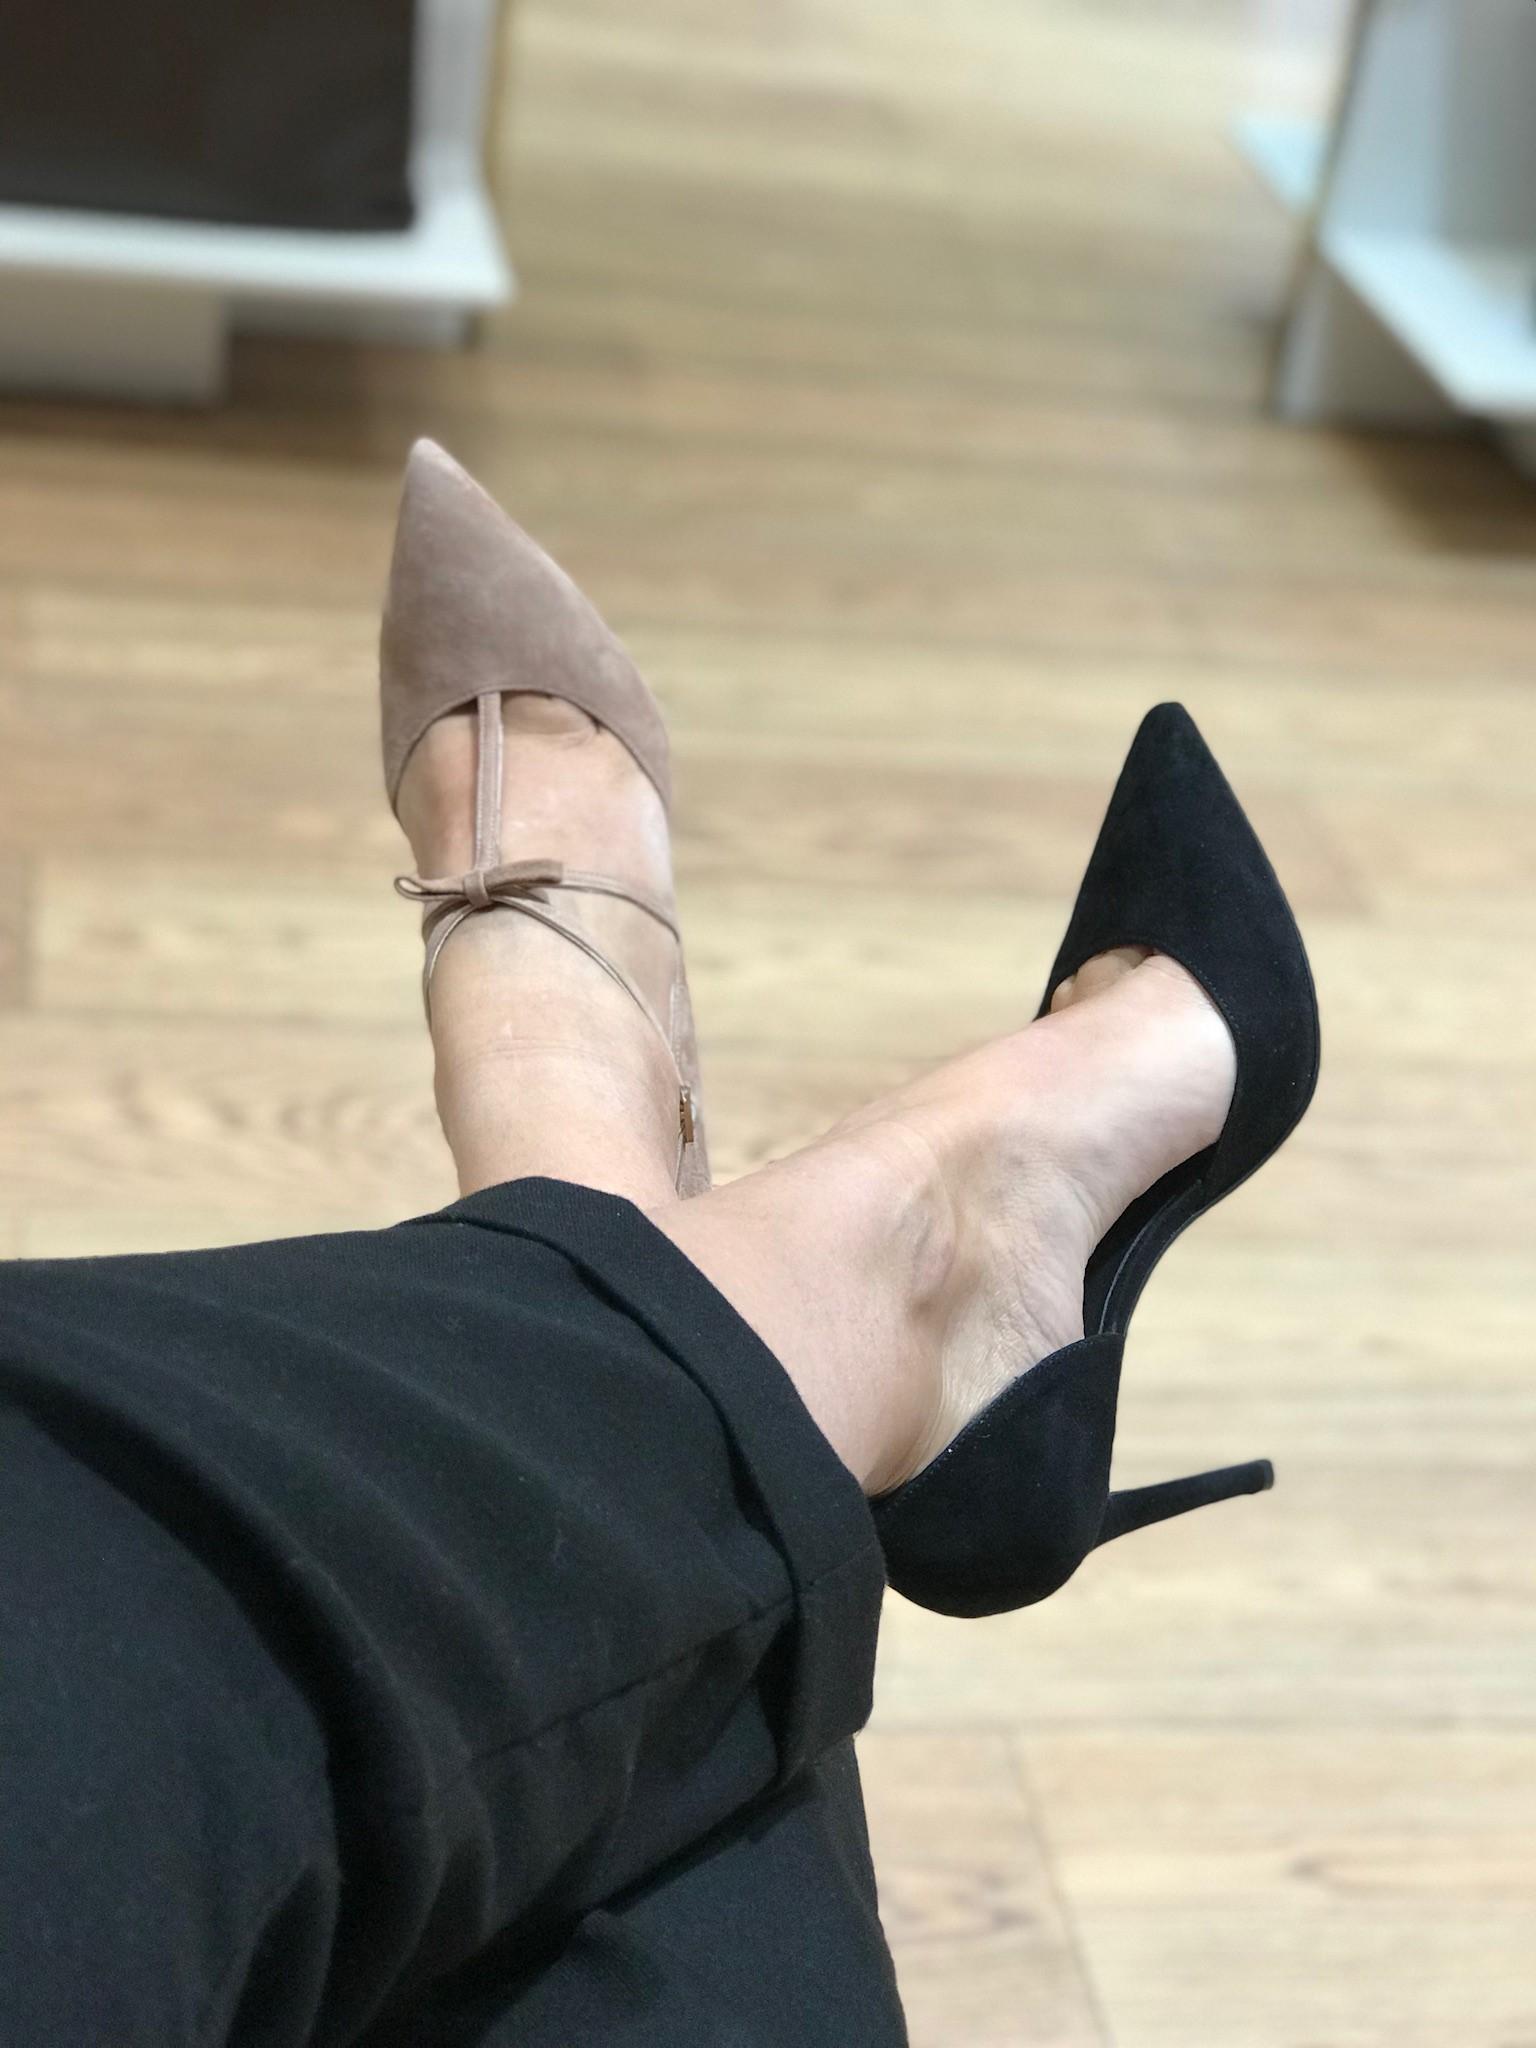 9672075ba04 Christmas shopping στη NAK Shoes! - Queen.gr